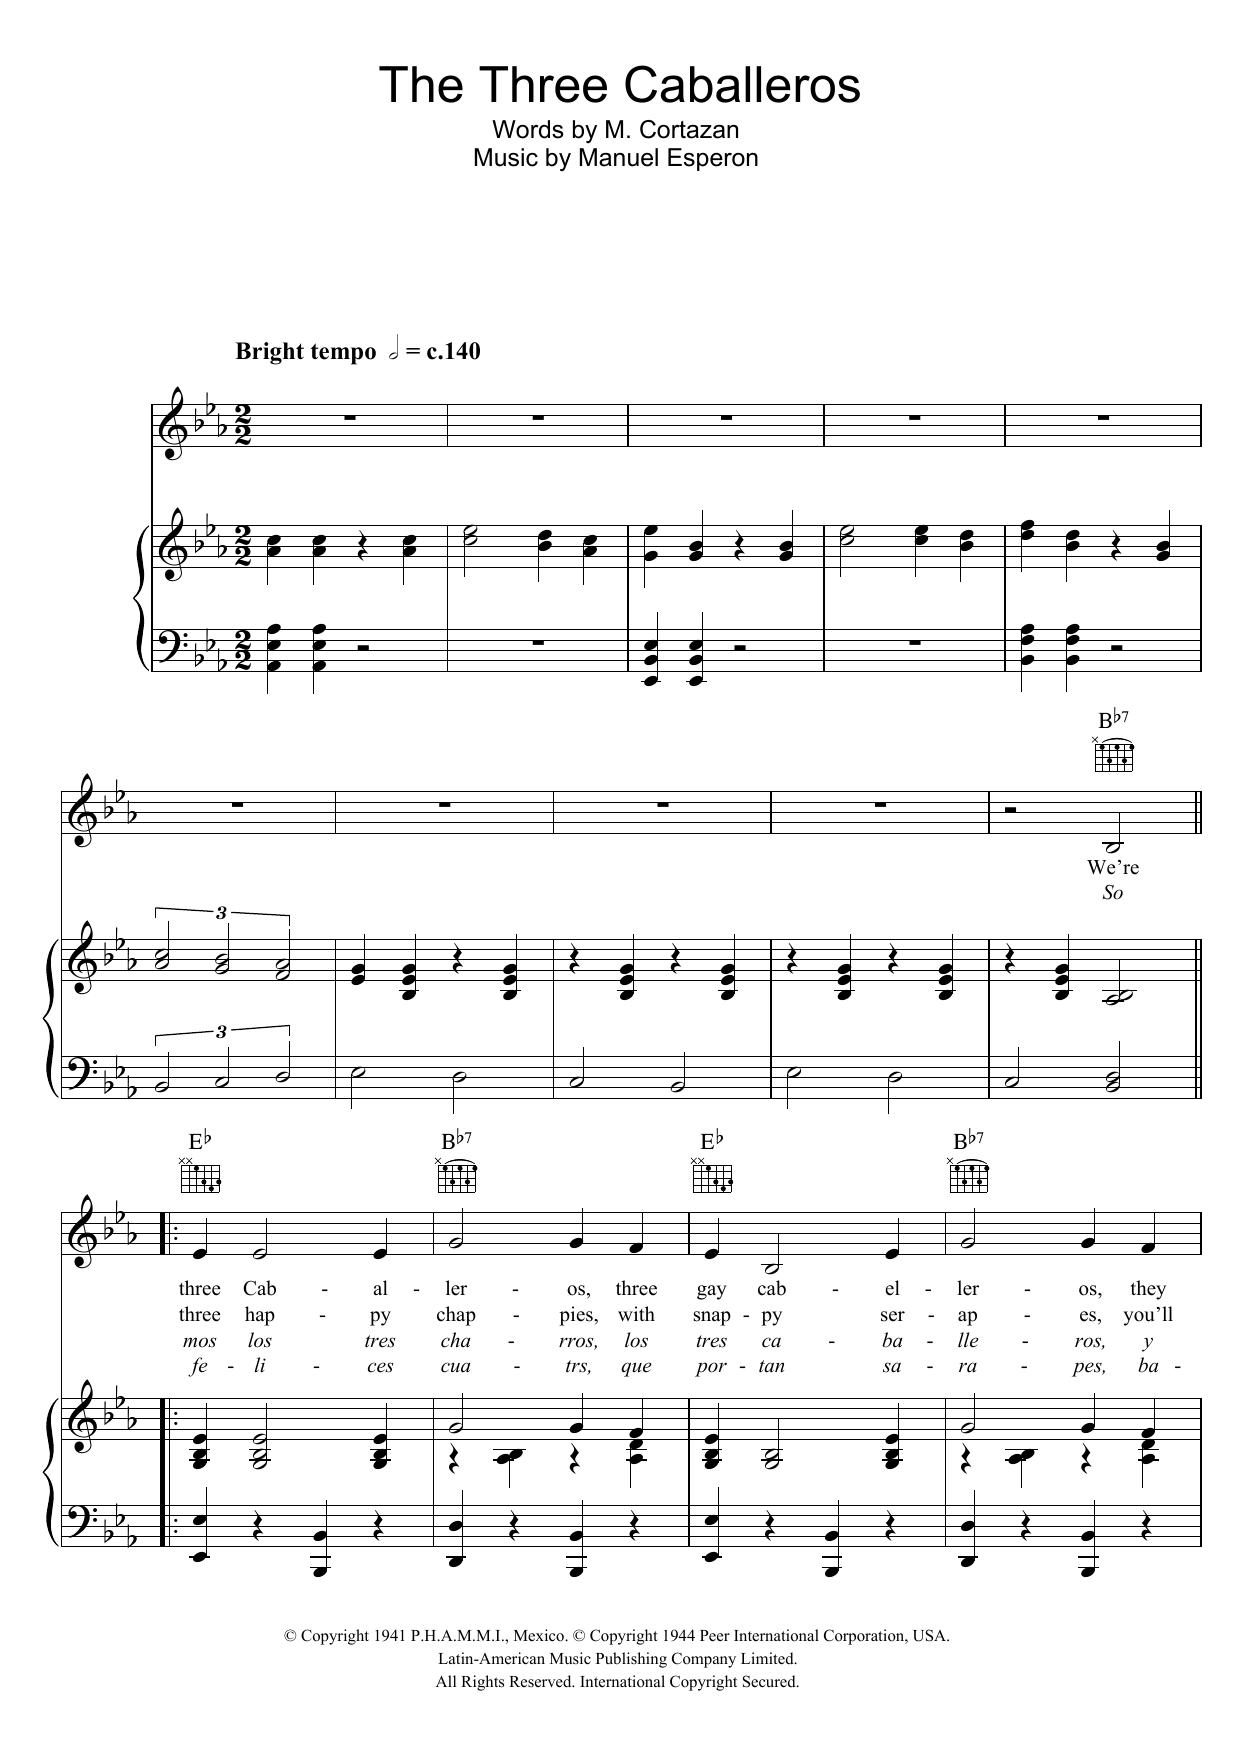 The Three Caballeros Sheet Music